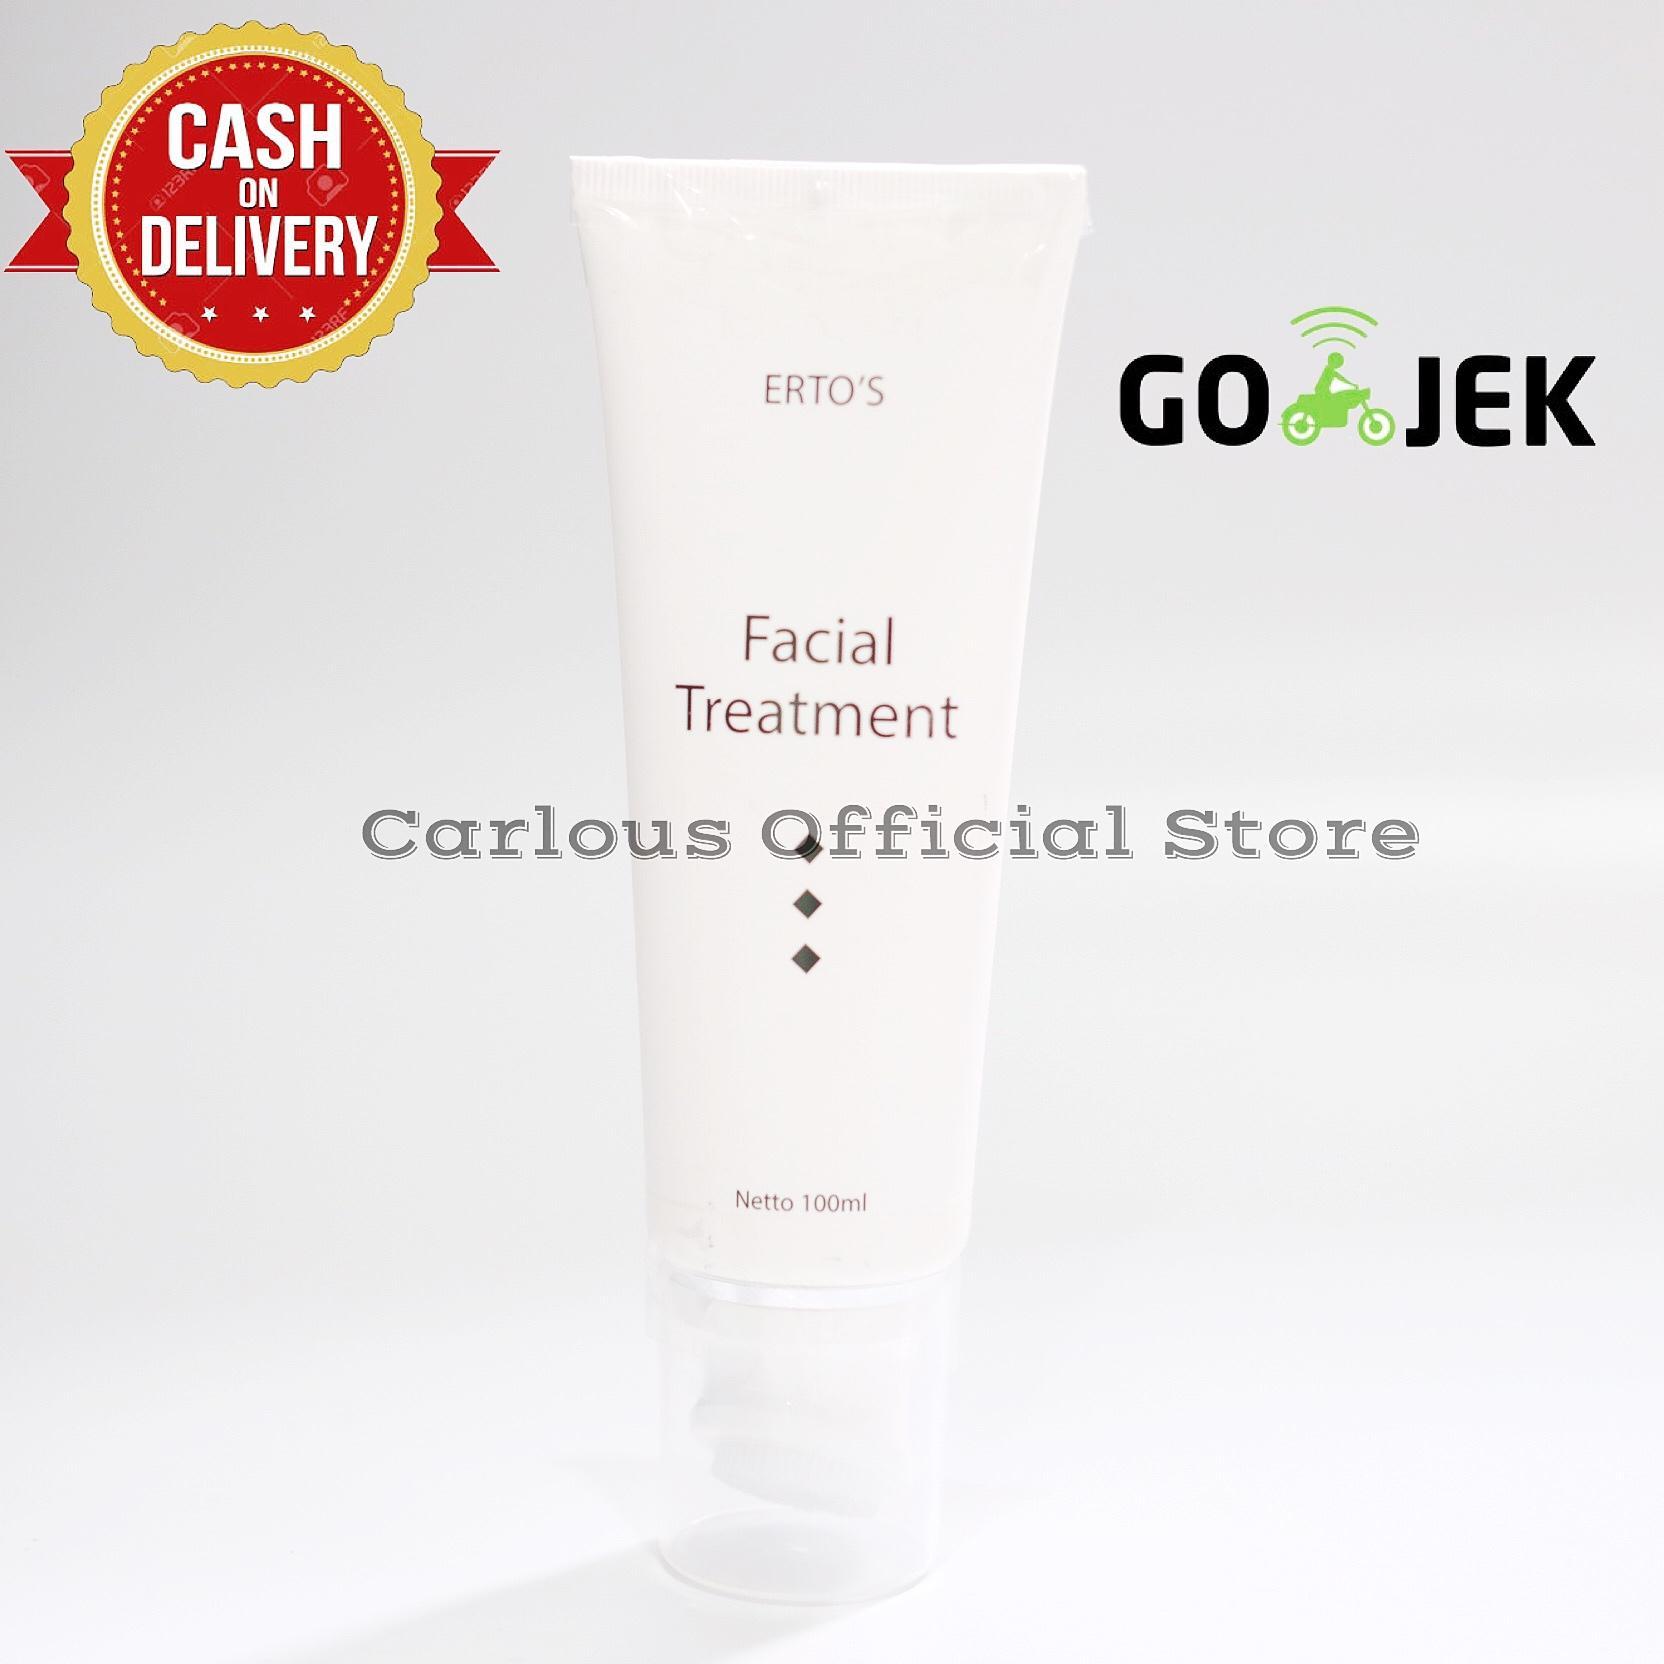 Harga Sabun Ertos Terupdate Bulan Oktober 2018 Cek Price Pembersih Wajah Carlous Facial Treatment Tanpa Disalon Menghaluskan Kulit Mengecilkan Pori